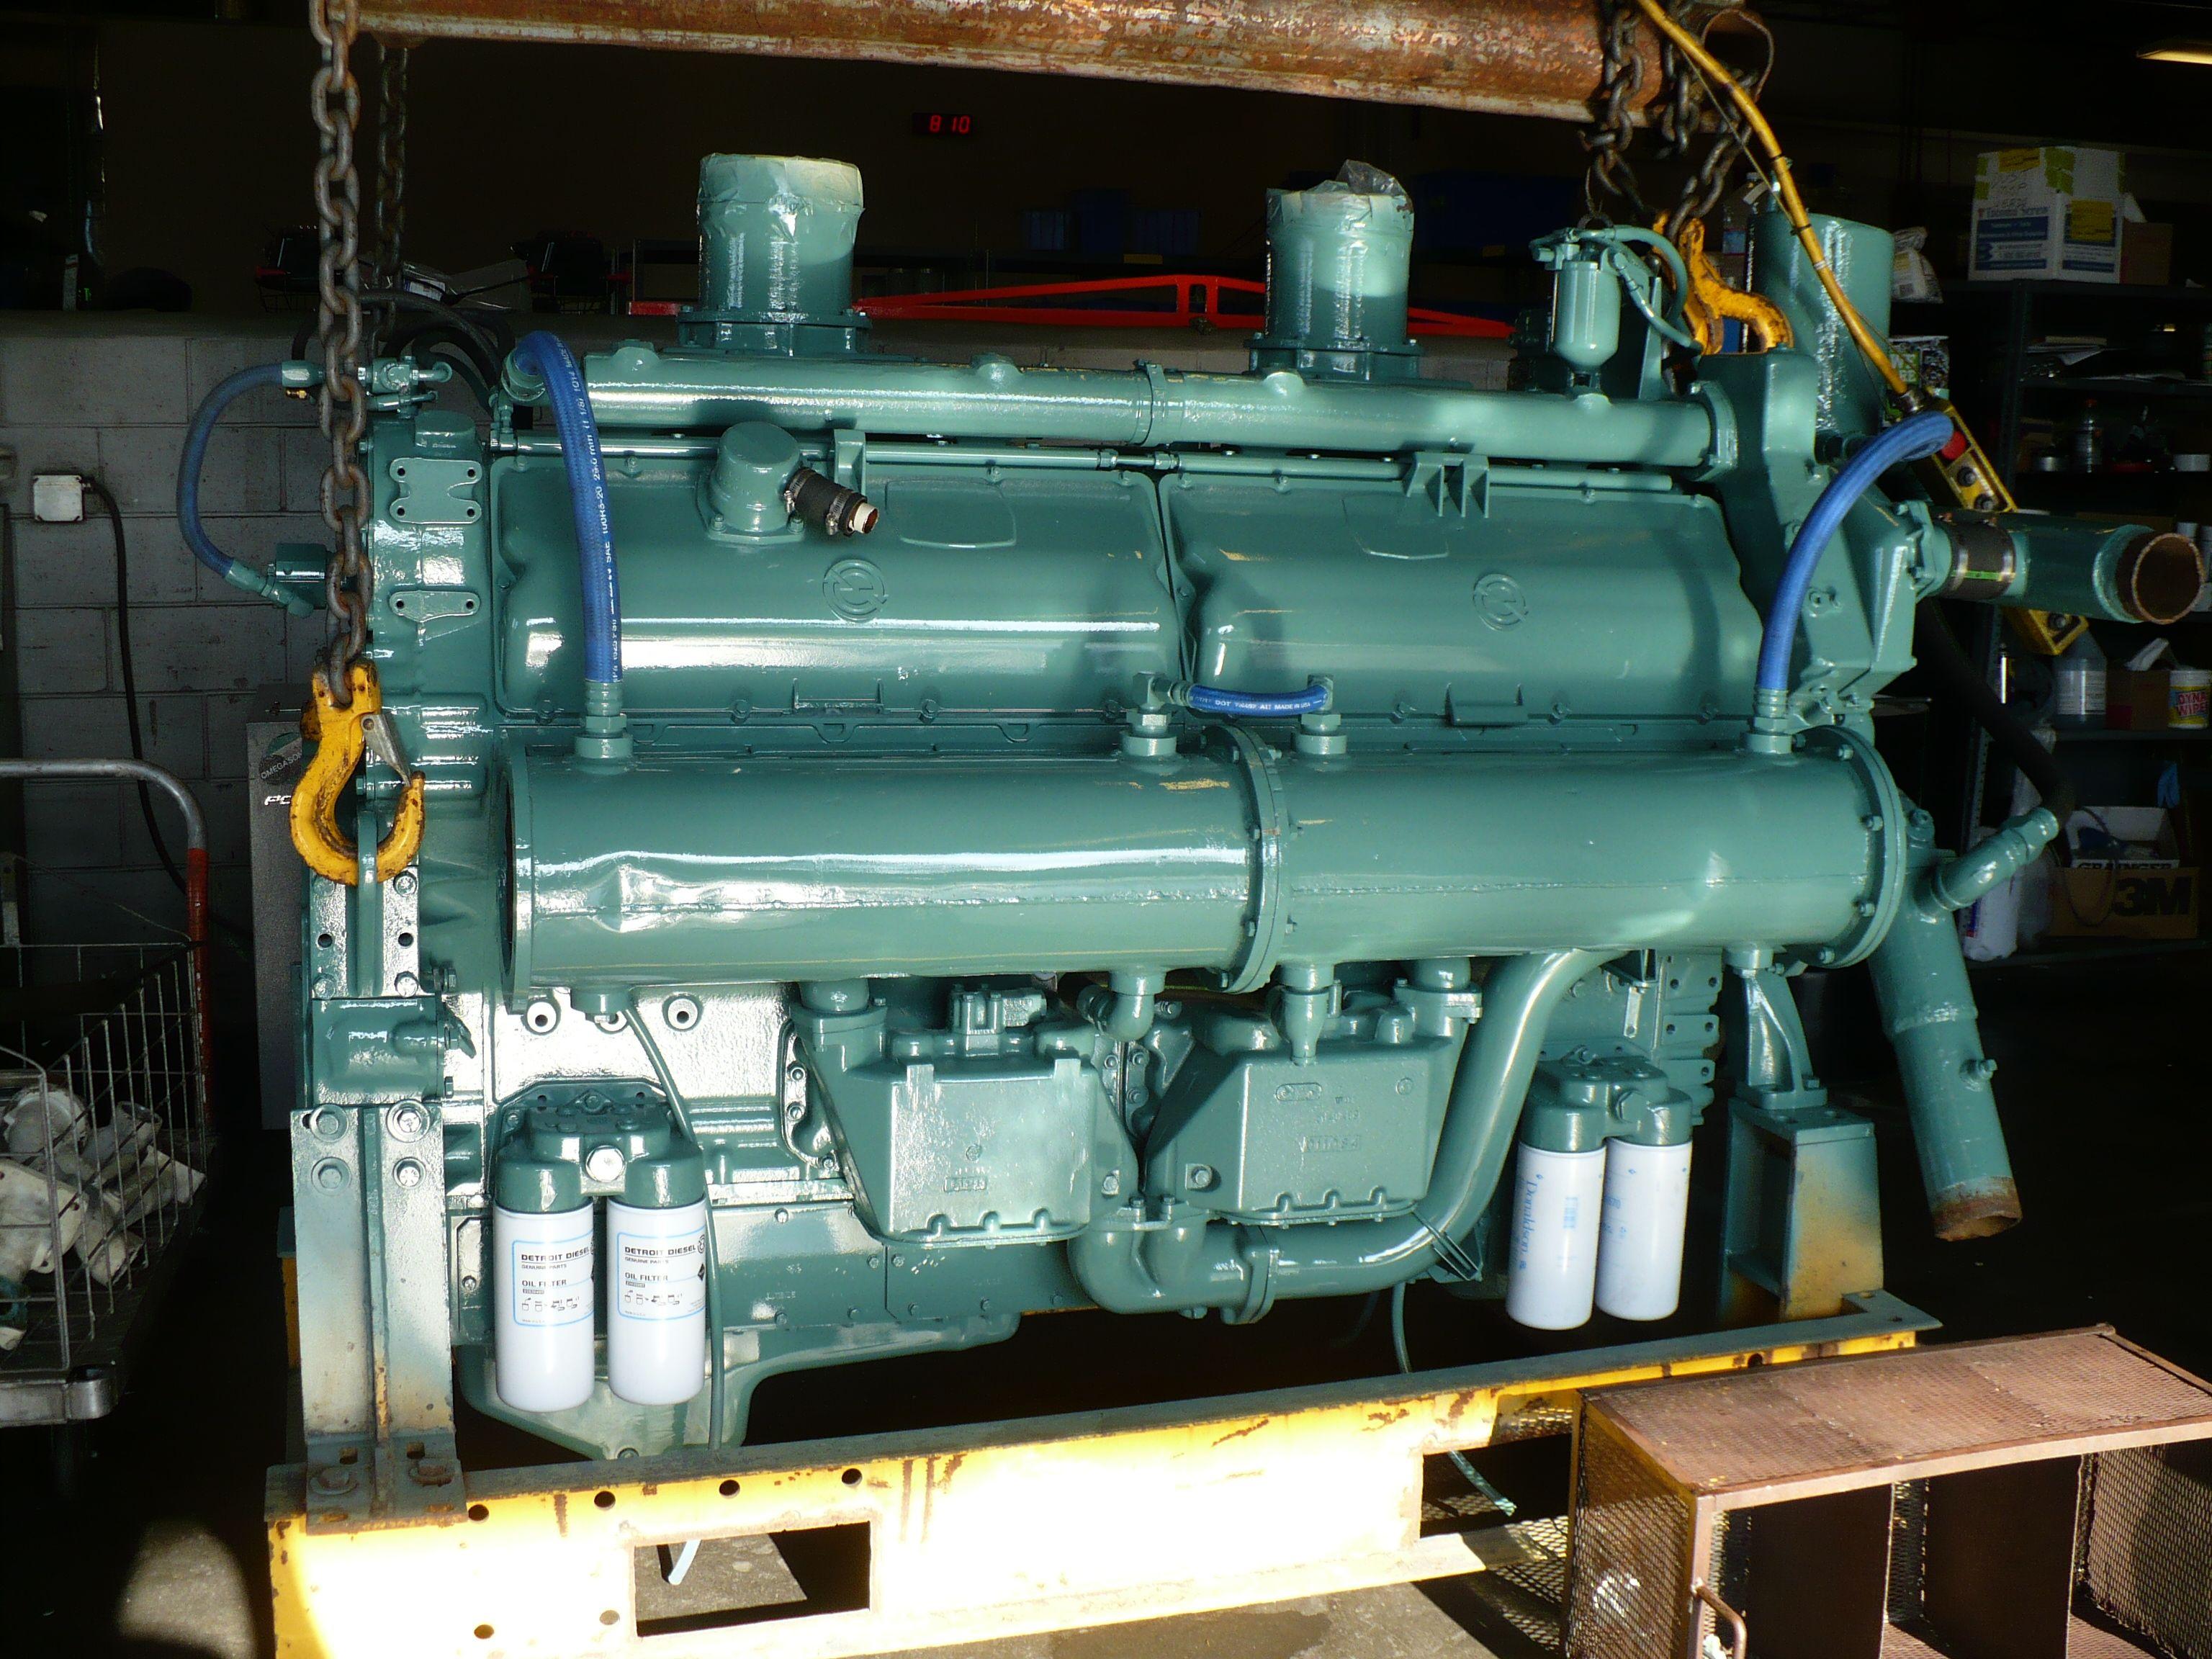 12v 149 Detroit Diesel Only Non Turbocharged 149 That I Ve Seen Detroit Diesel Diesel Crate Engines Big Trucks